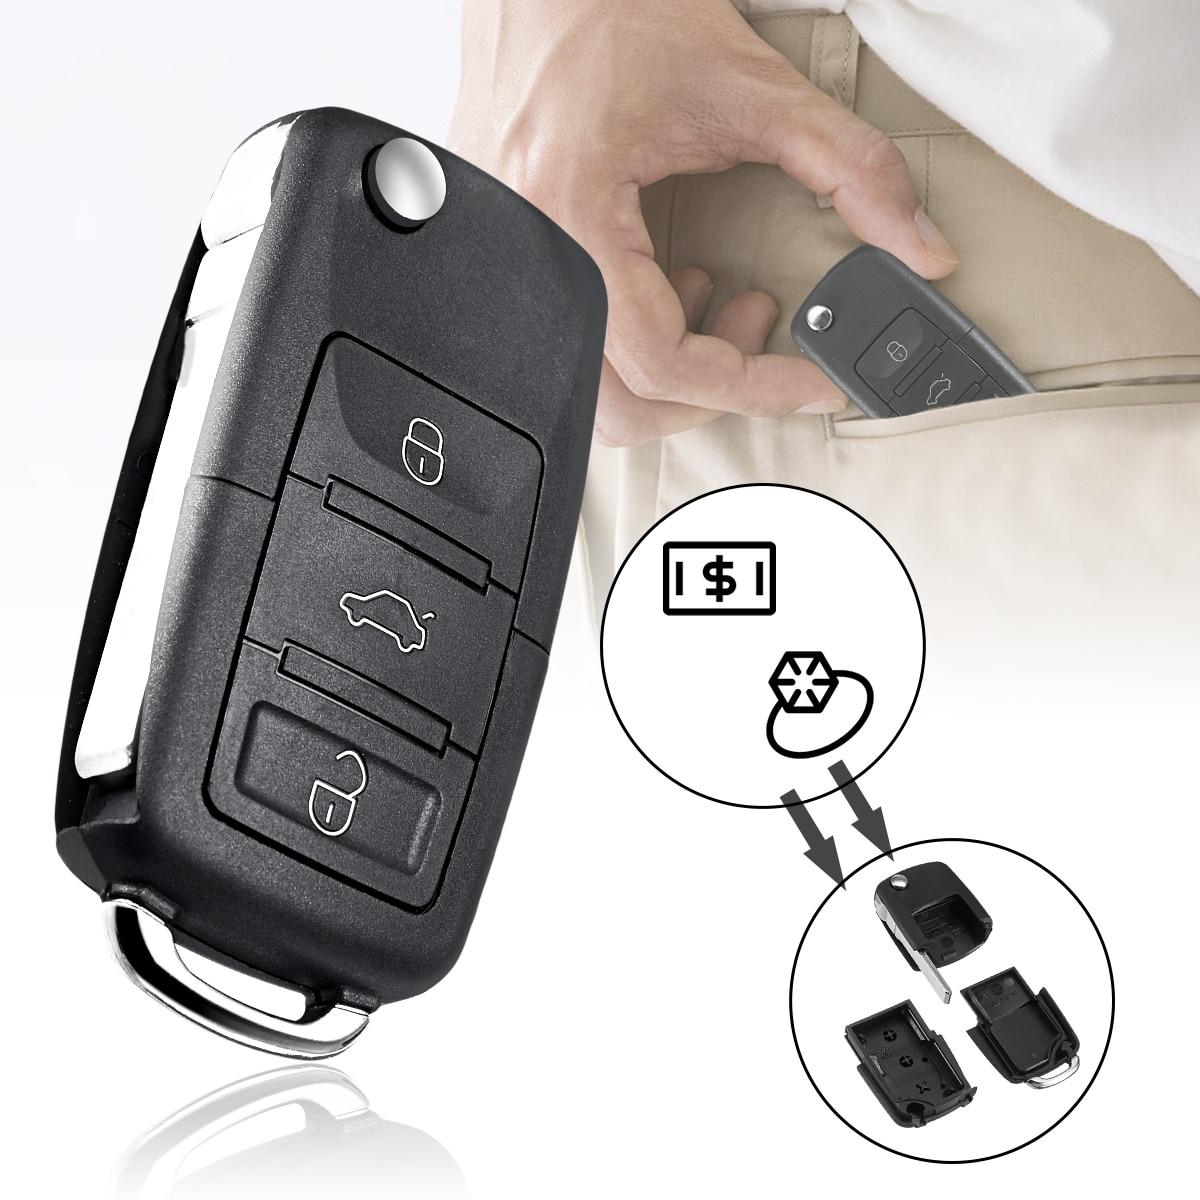 Car Key Safe Compartment Container Secret Hide Hollow Stash Tool Key Case for Car Portable Safe Storage Key Container